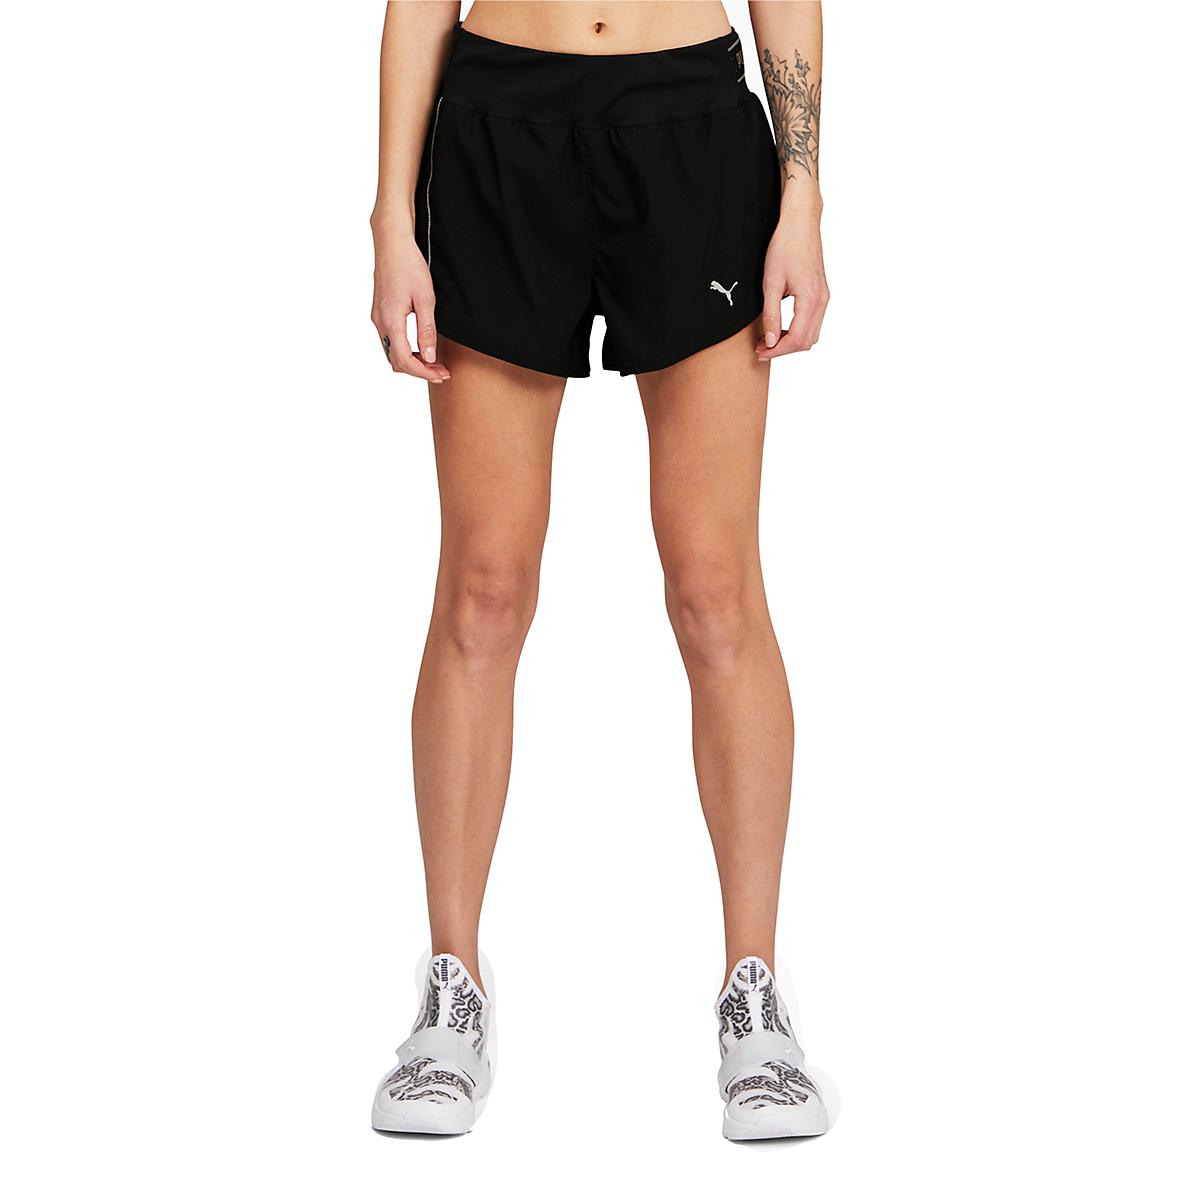 "Women's Puma COOLadapt 3"" Running Shorts - Color: Puma Black - Size: XS, Puma Black, large, image 1"